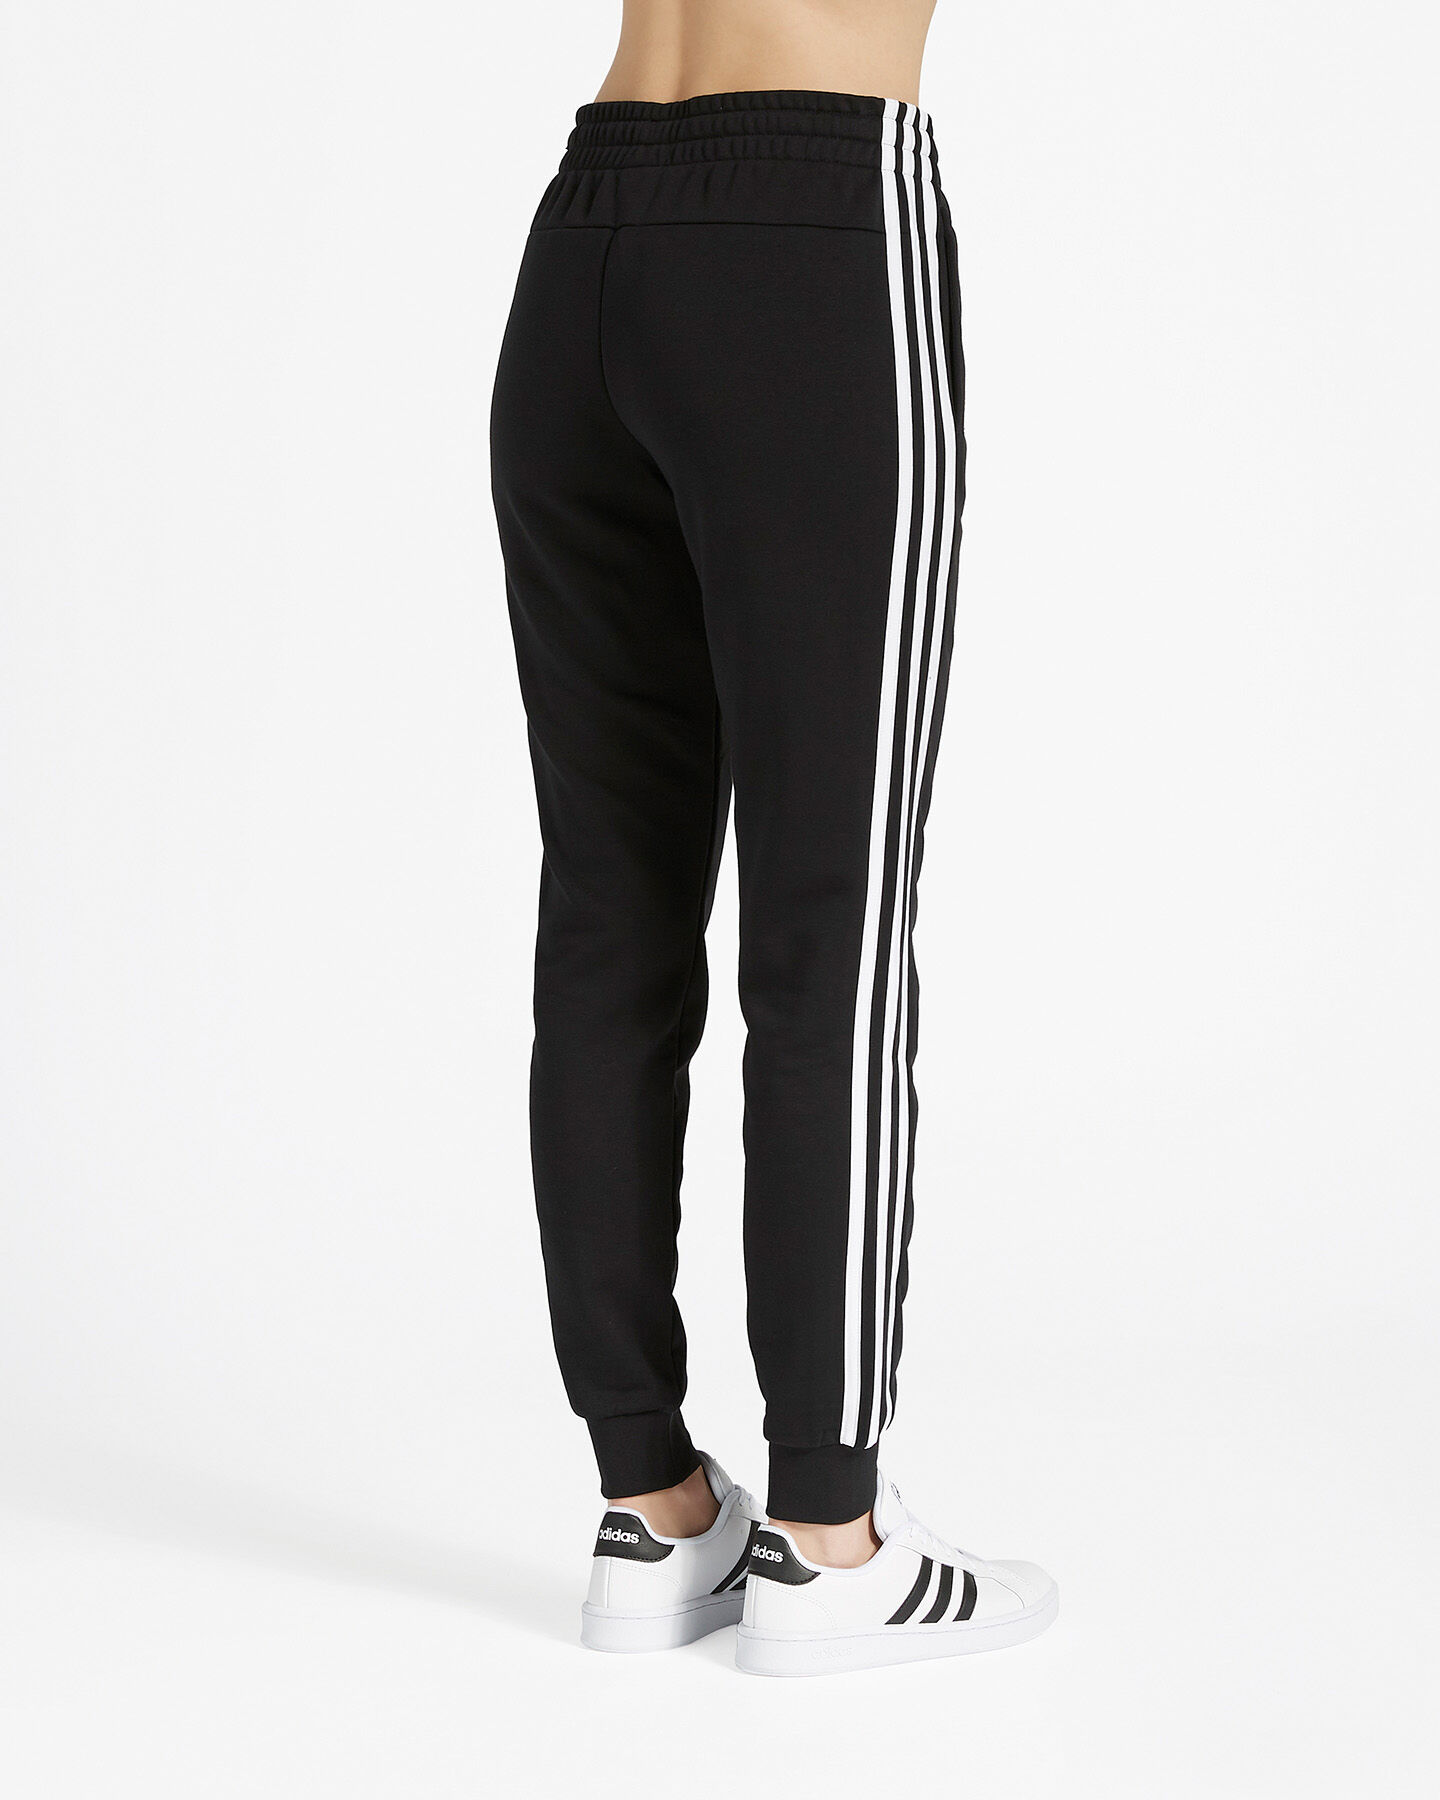 Pantalone ADIDAS ESSENTIALS 3 STRIPES W S4056301 scatto 1